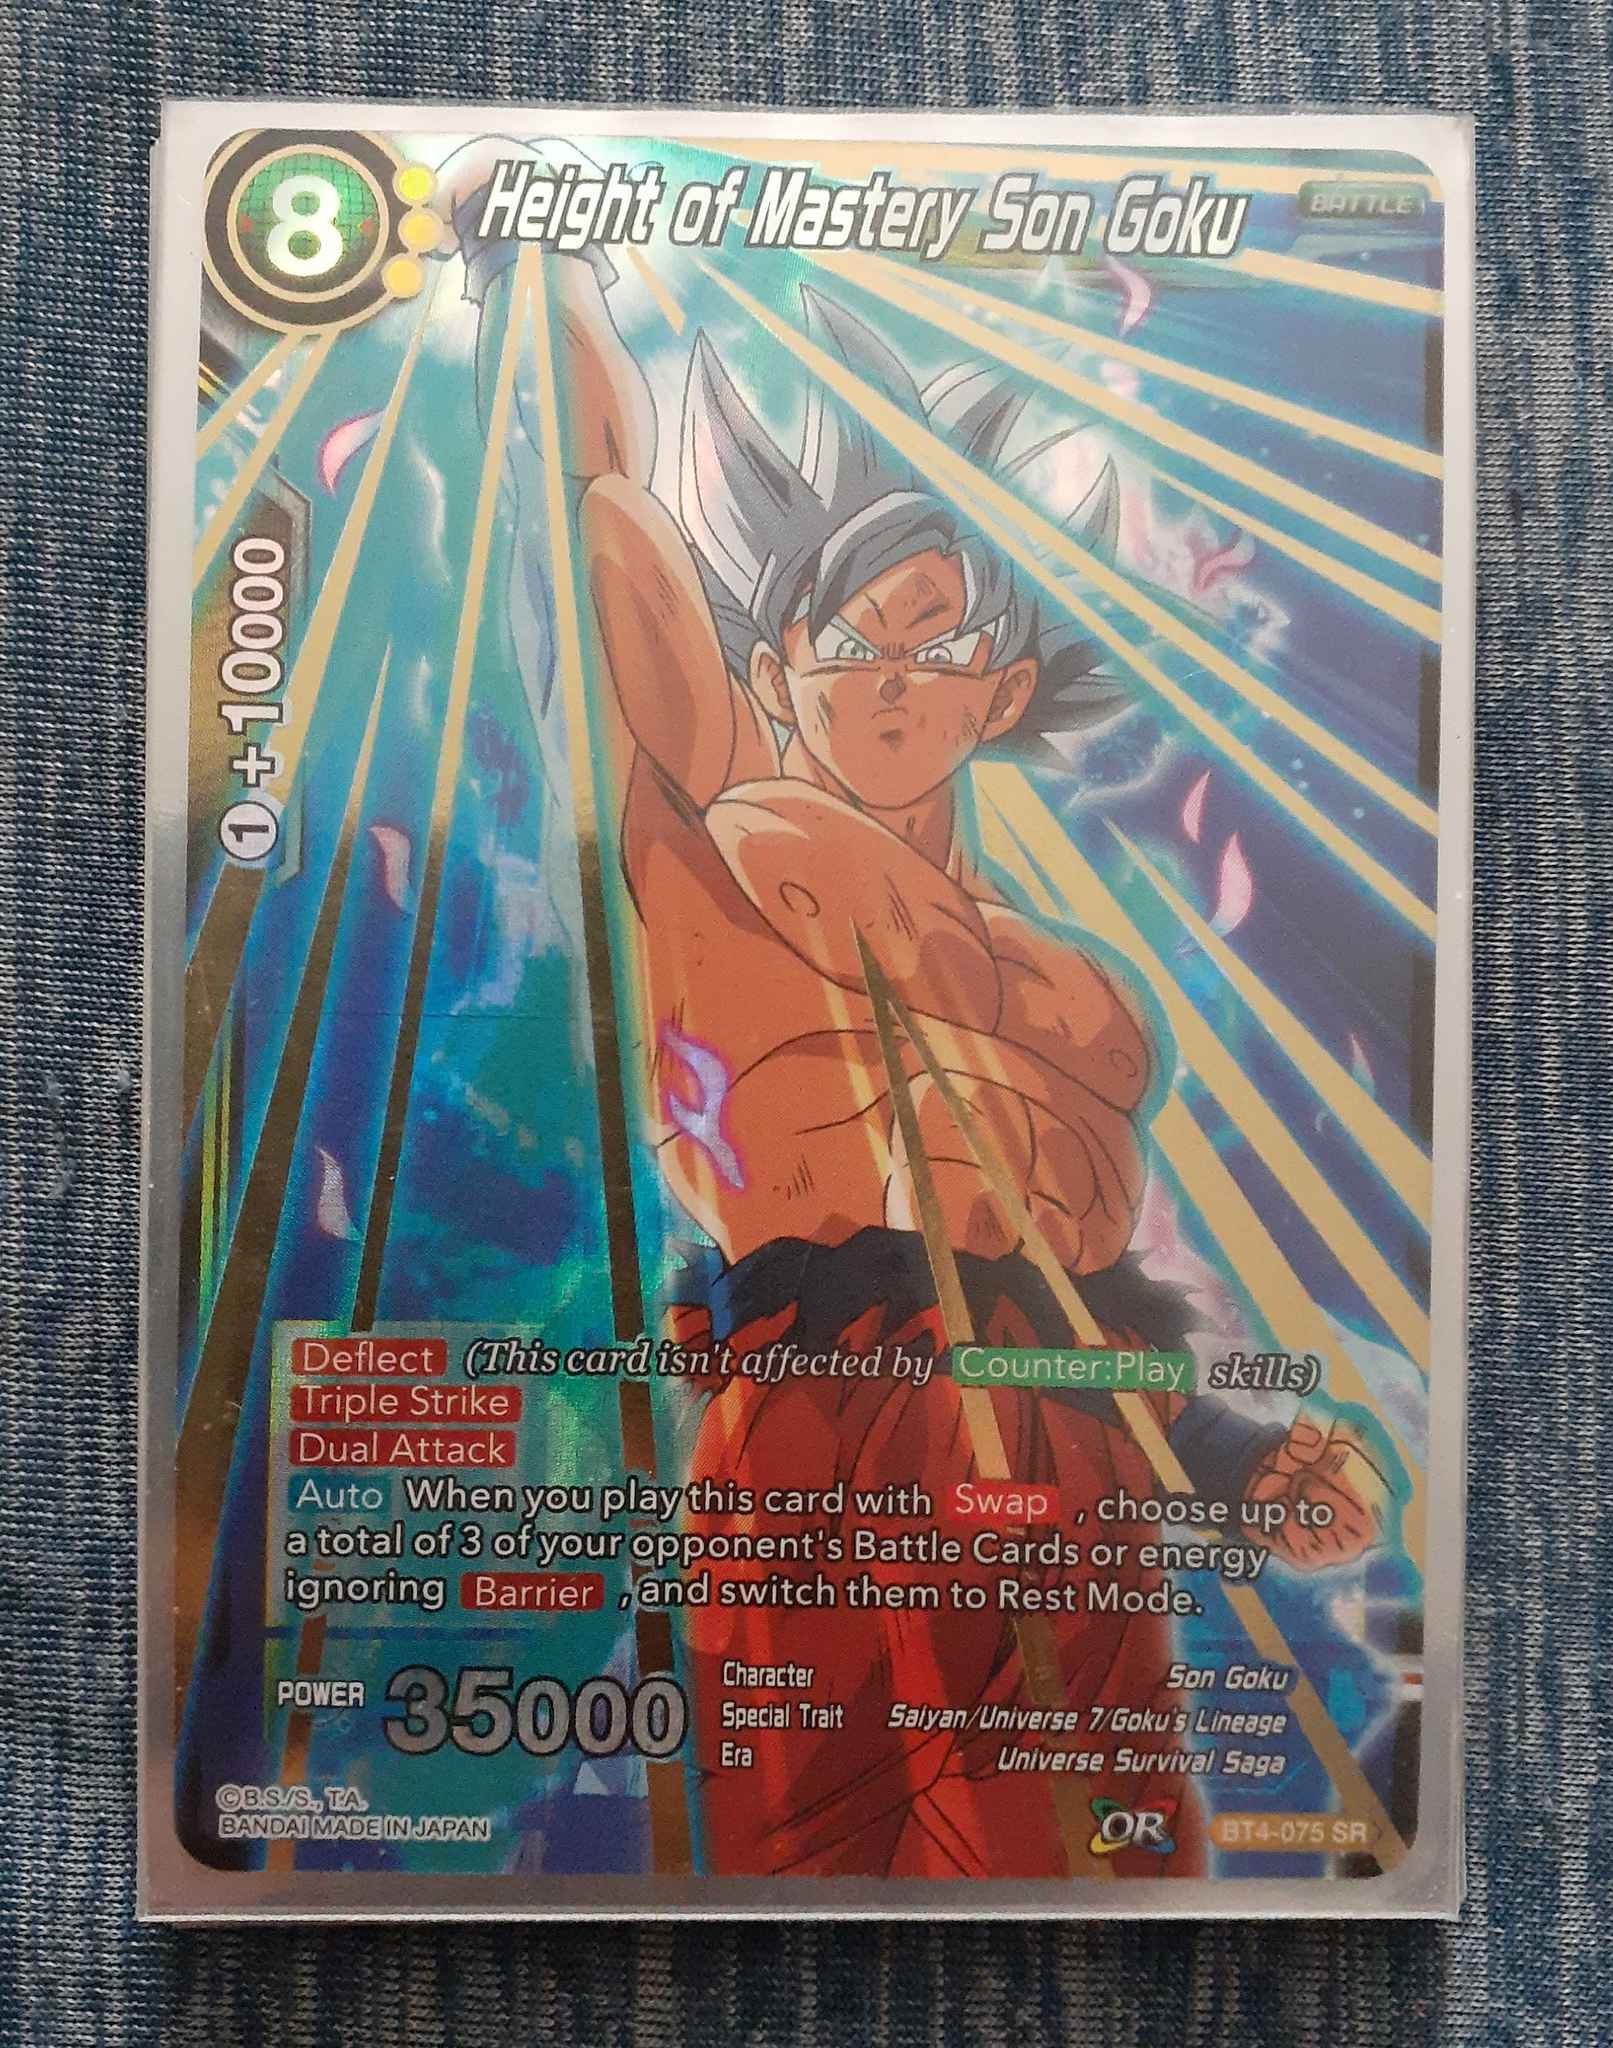 BT4-075 SR Dragon Ball Super TCG HEIGHT OF MASTERY SON GOKU